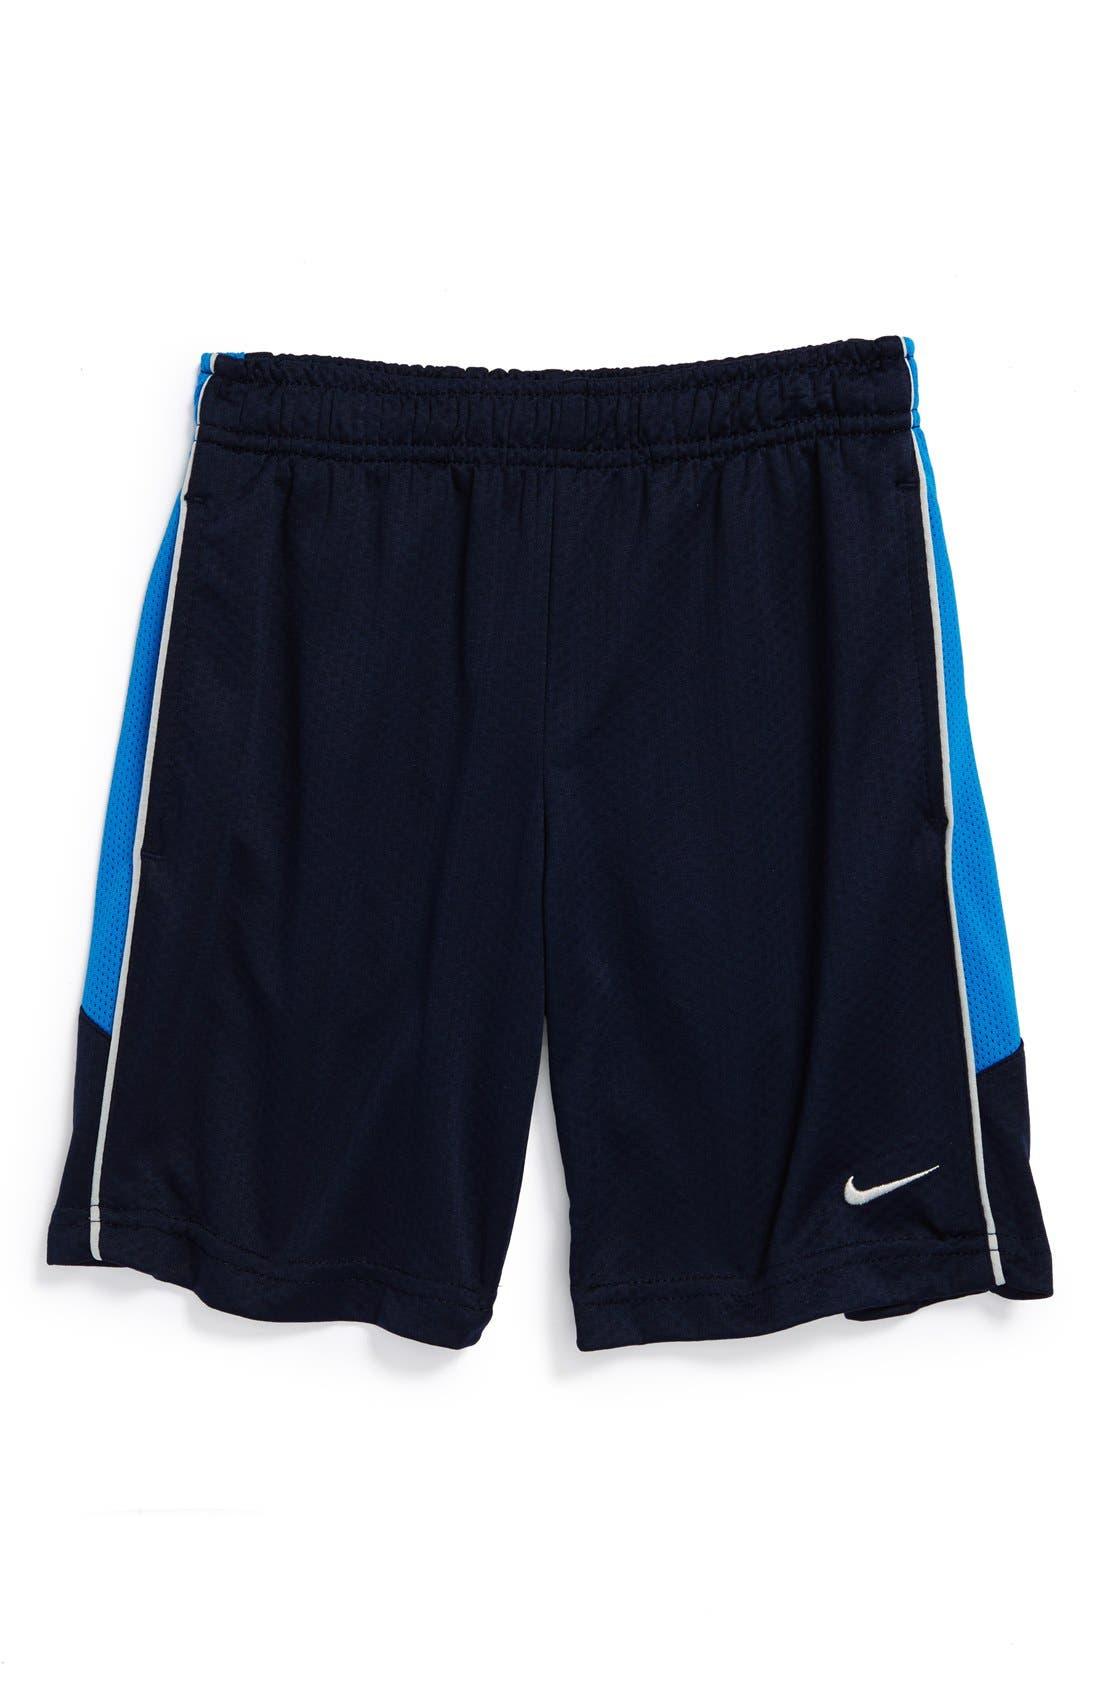 Alternate Image 1 Selected - Nike 'Acceler8' Dri-FIT Shorts (Little Boys)